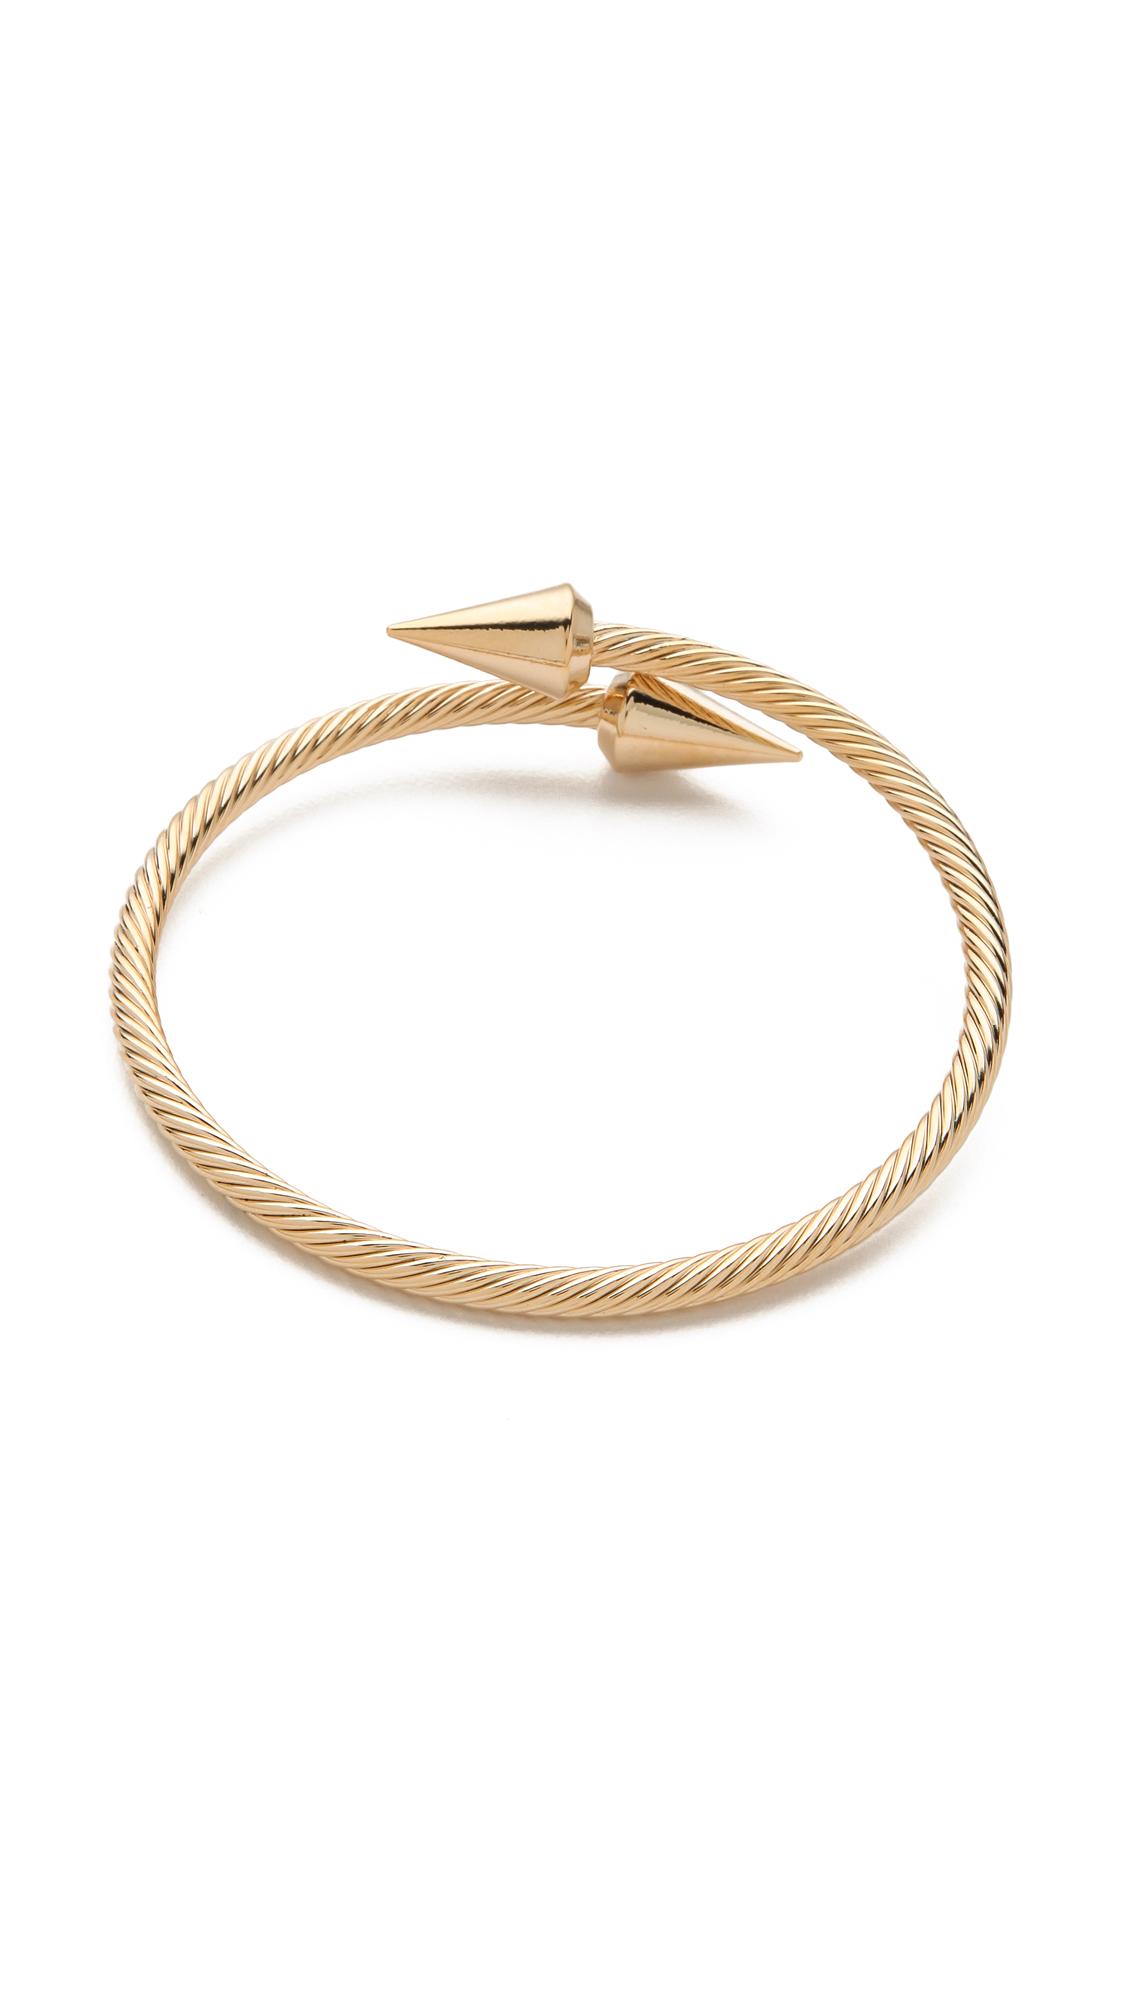 Jules smith zoe bracelet